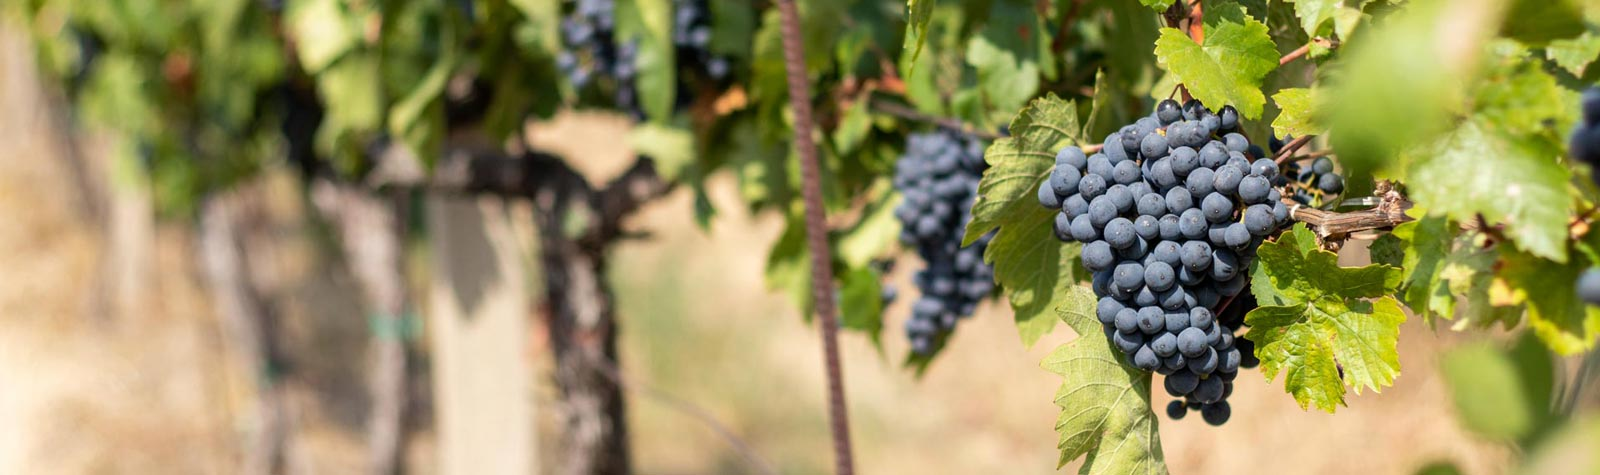 Vinobraní začíná